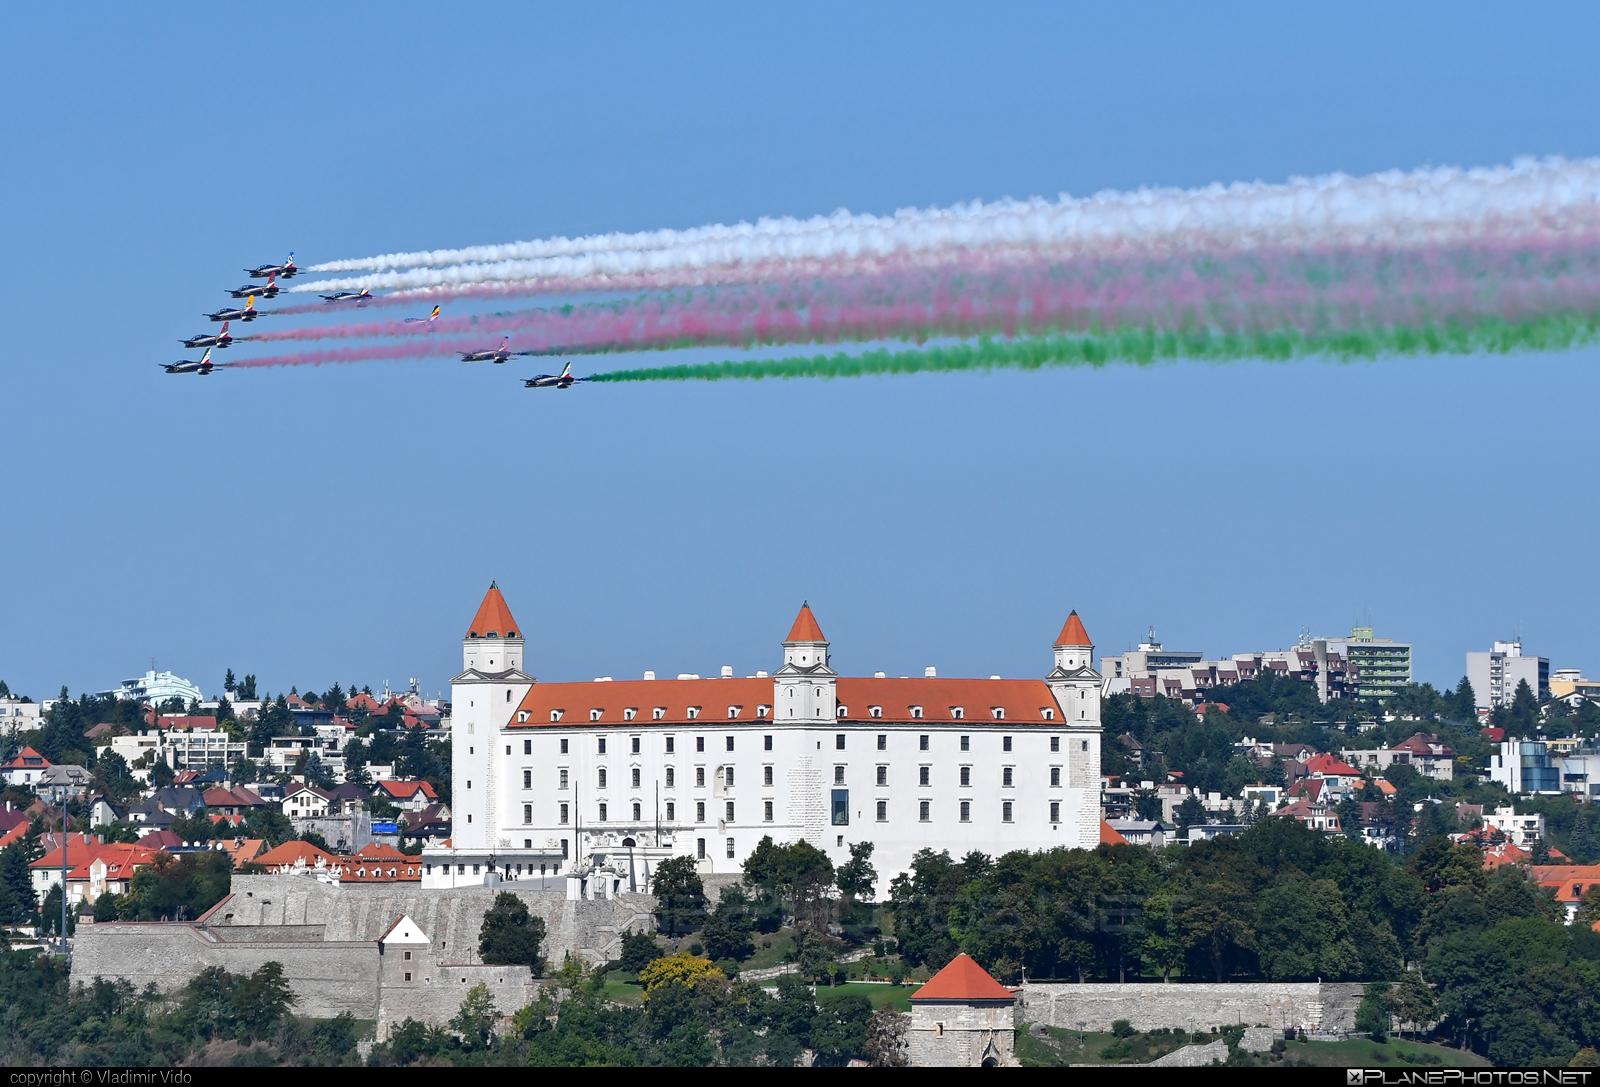 Aermacchi MB-339-A/PAN - MM55054 operated by Aeronautica Militare (Italian Air Force) #AeronauticaMilitare #ItalianAirForce #aermacchi #aermacchi339 #aermacchimb339 #aermacchimb339apan #mb339 #mb339apan